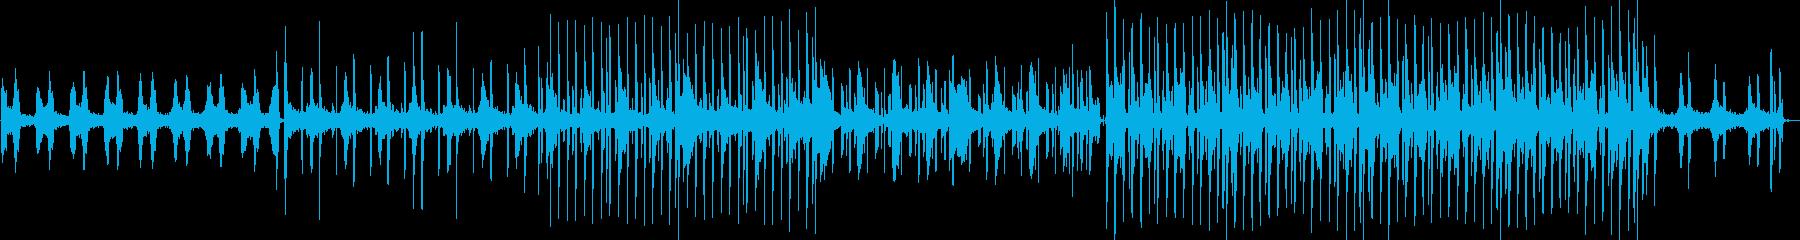 ChillなオシャレHipHopの再生済みの波形